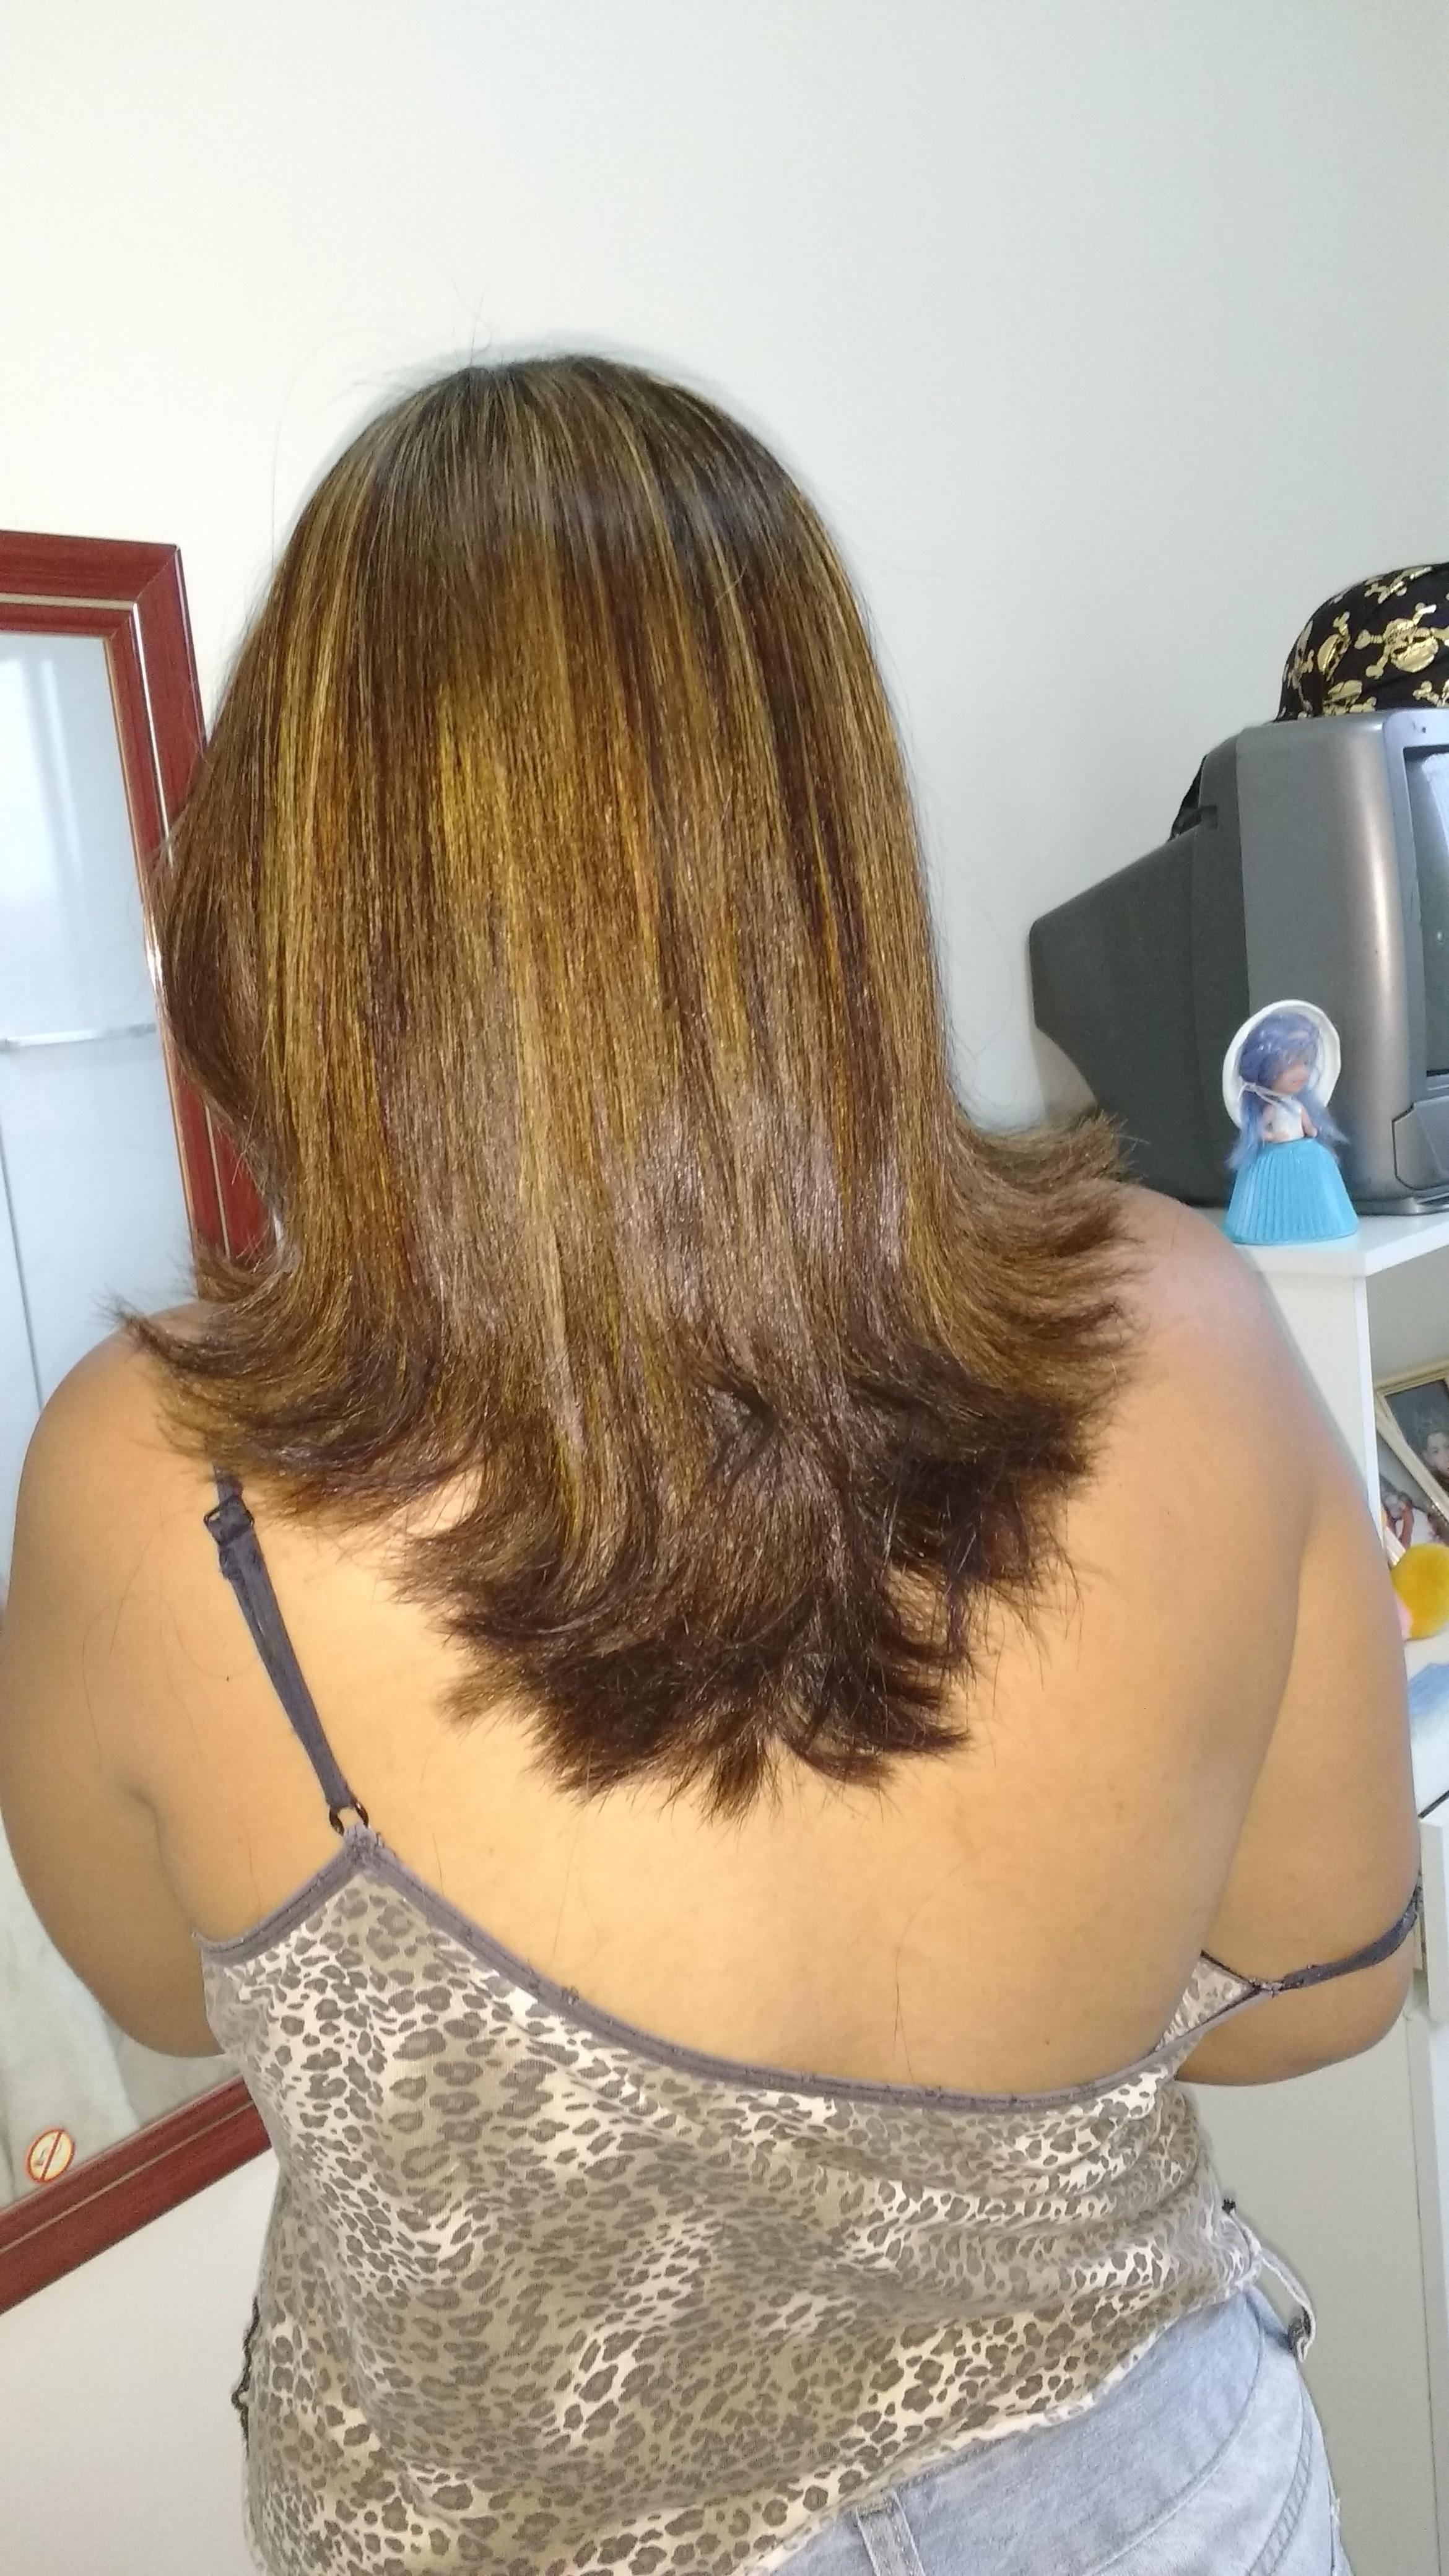 Corte e luzes.. cabelo